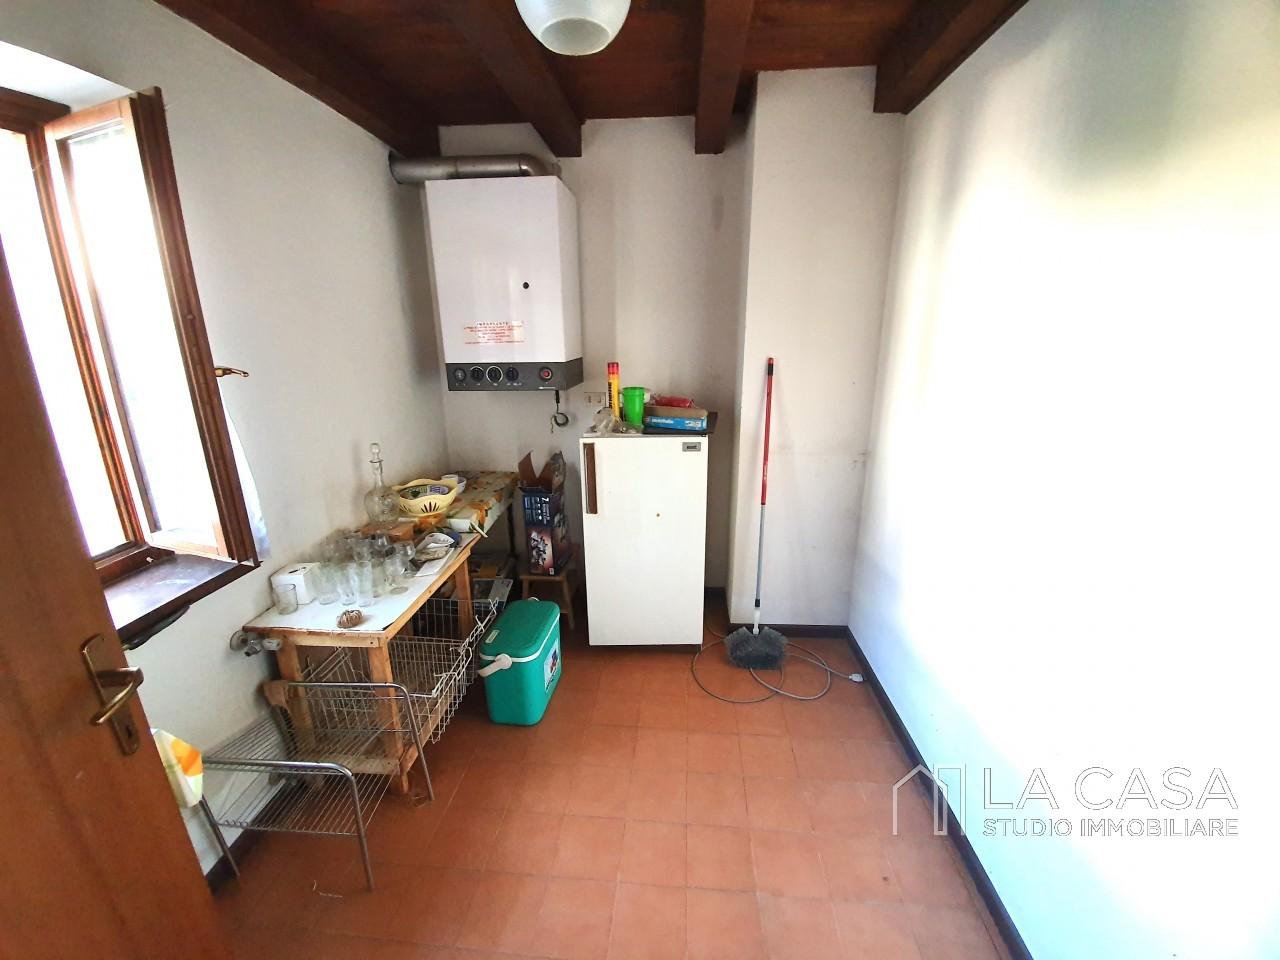 Casa indipendente in Linea - Rif.C6 https://media.gestionaleimmobiliare.it/foto/annunci/191125/2114313/1280x1280/012__20191125_115650_wmk_1.jpg